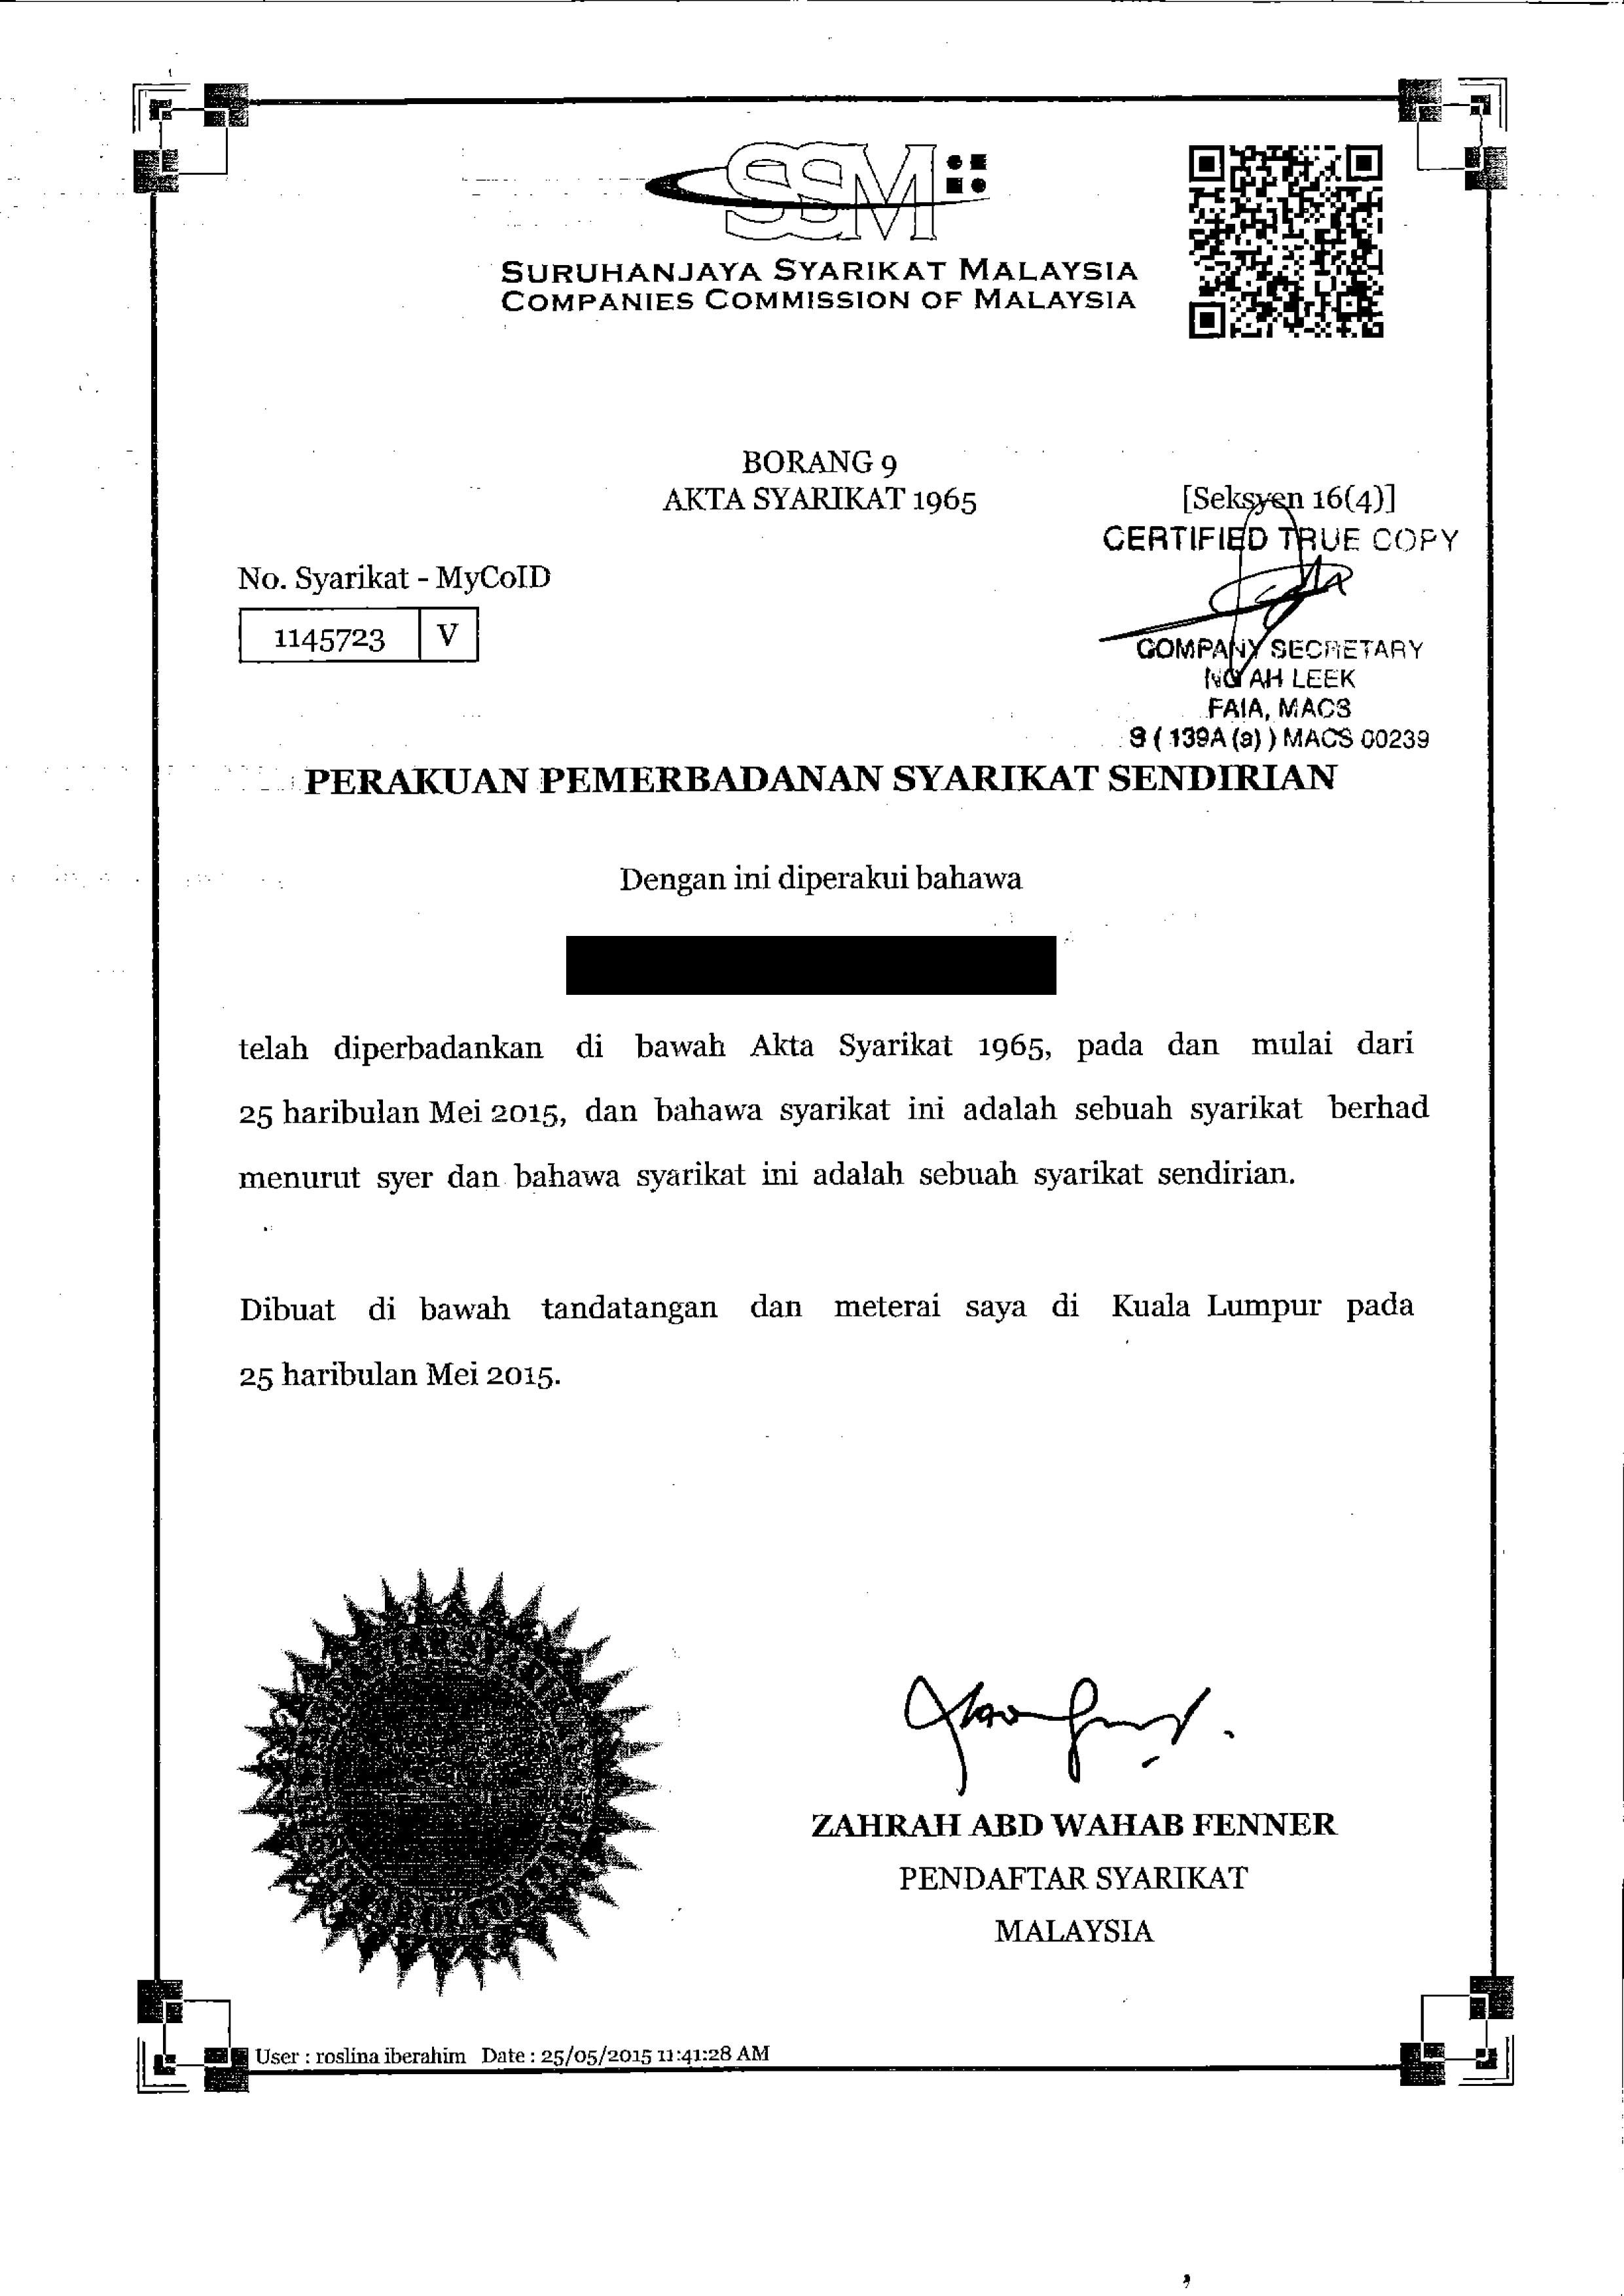 SSM Certificate